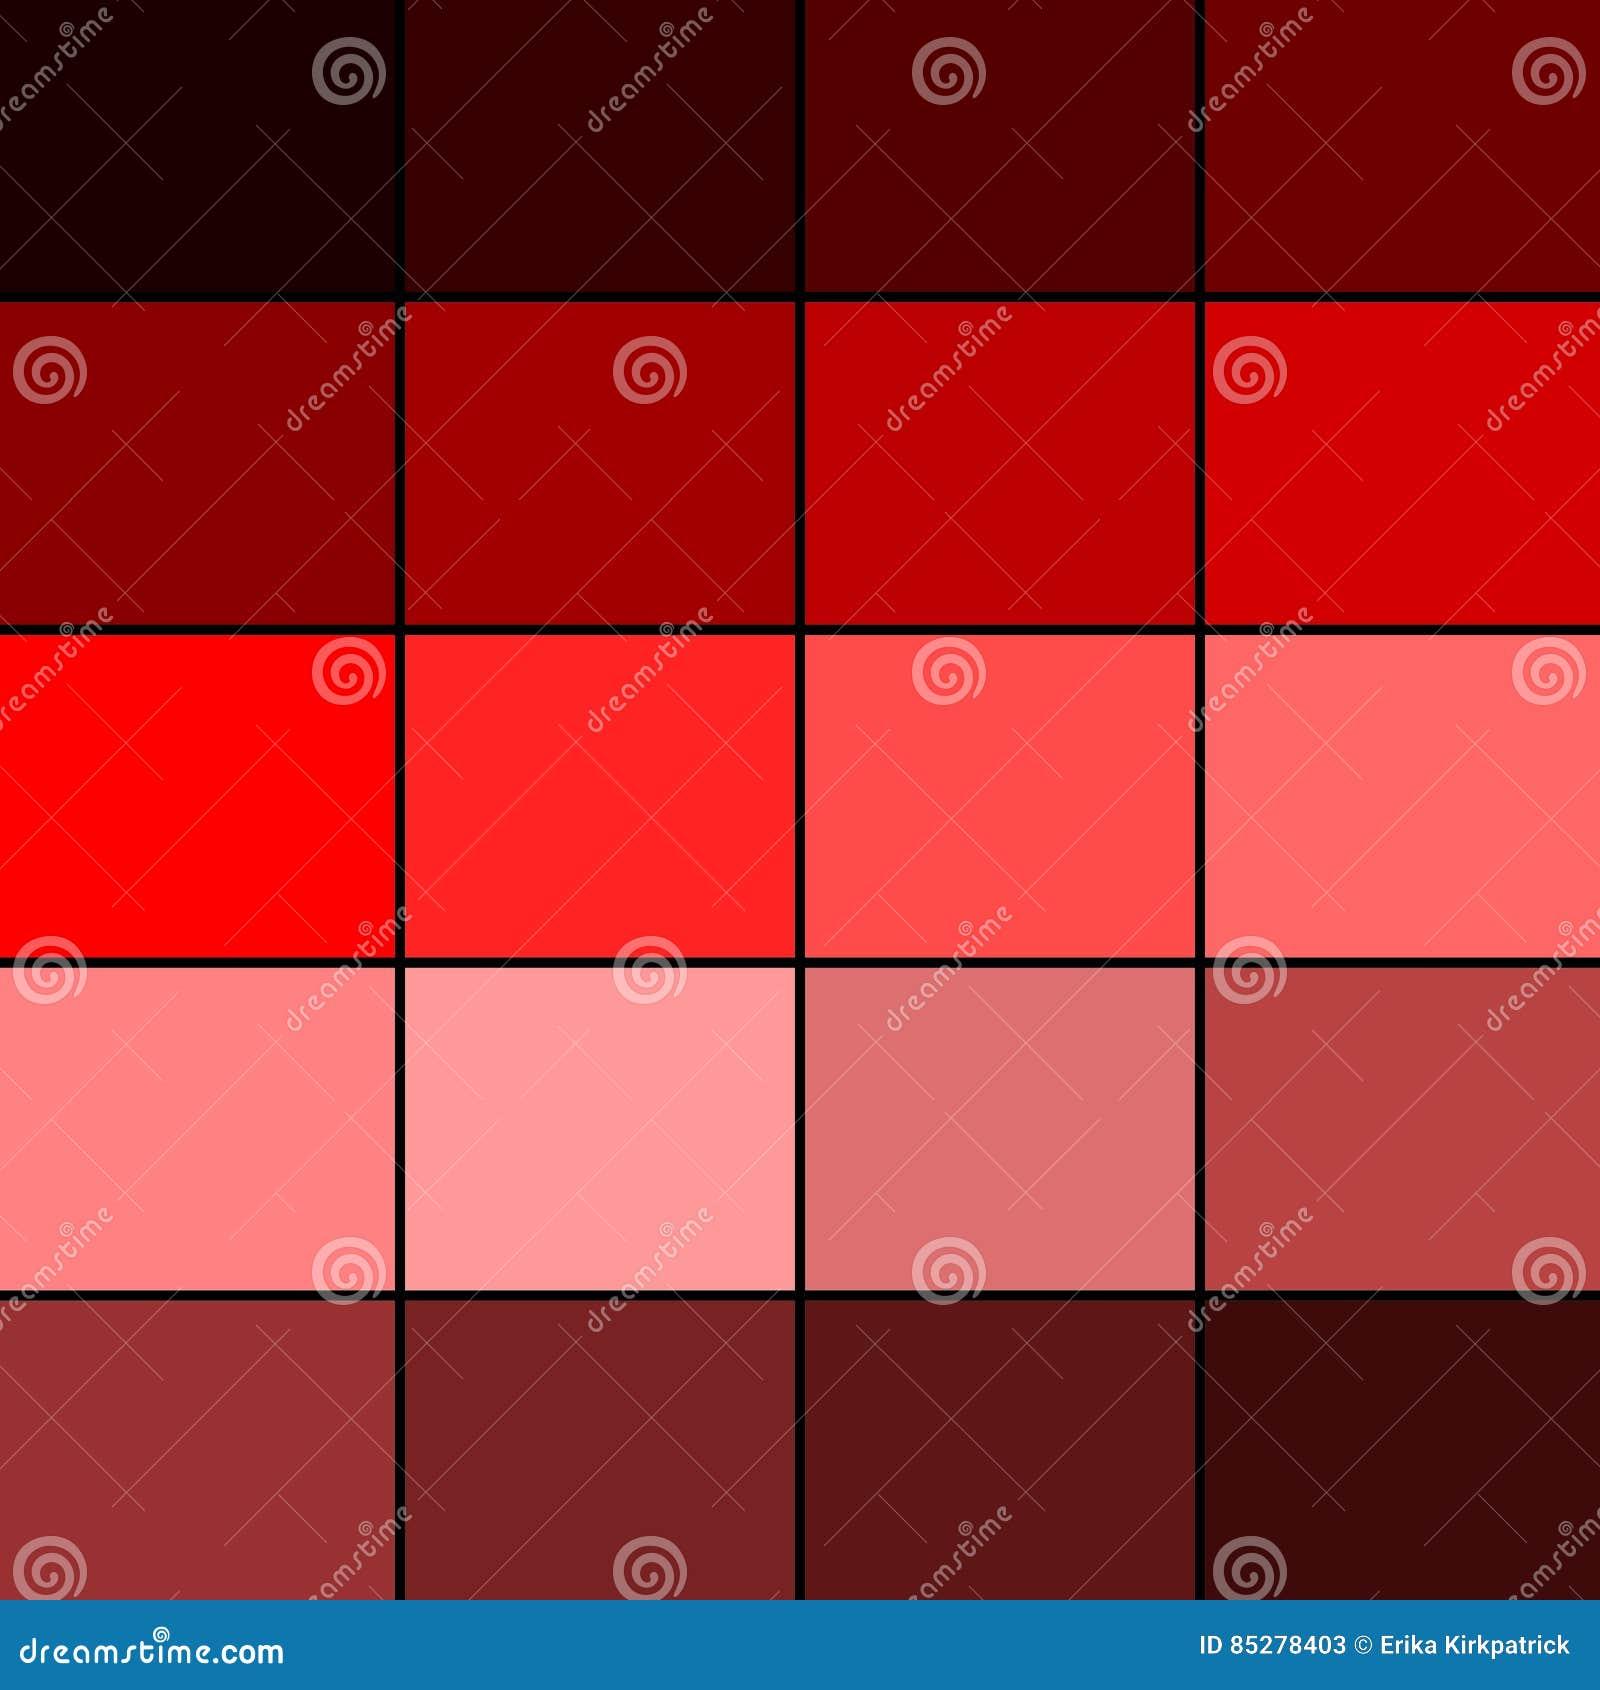 Uncategorized Red Color Pallette red color palette stock illustration image of colored 85278403 palette